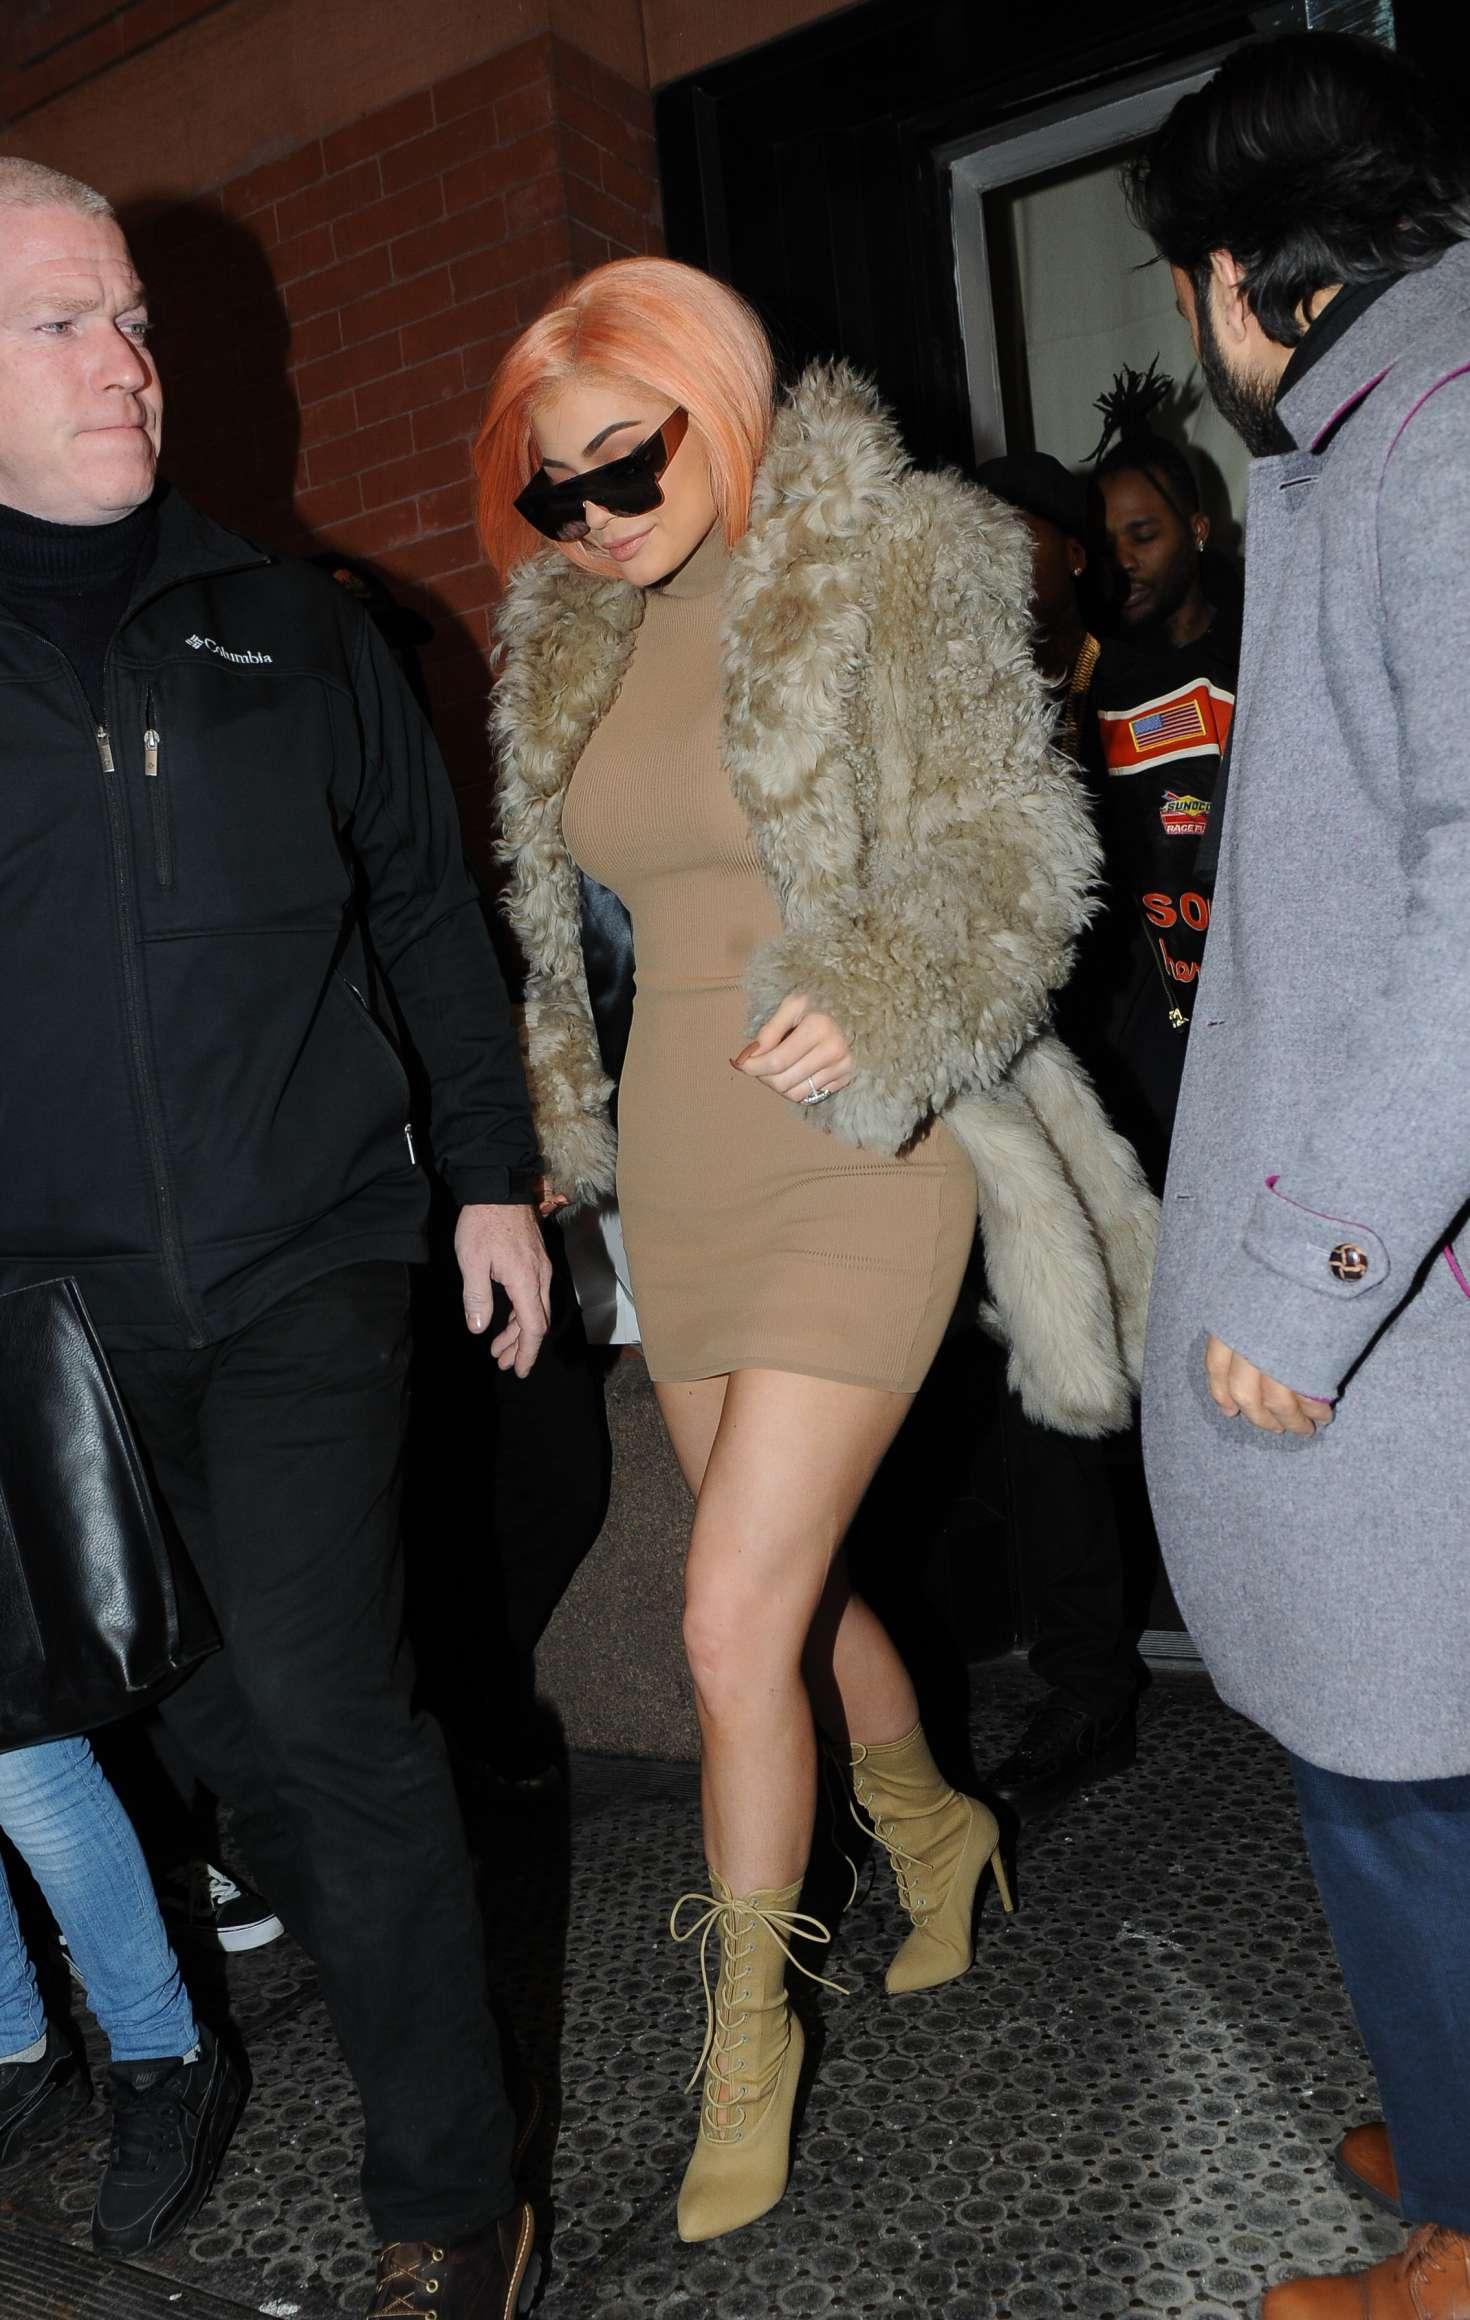 Kylie jenner leaving the mercer hotel in manhattan nudes (14 photo), Bikini Celebrity pics